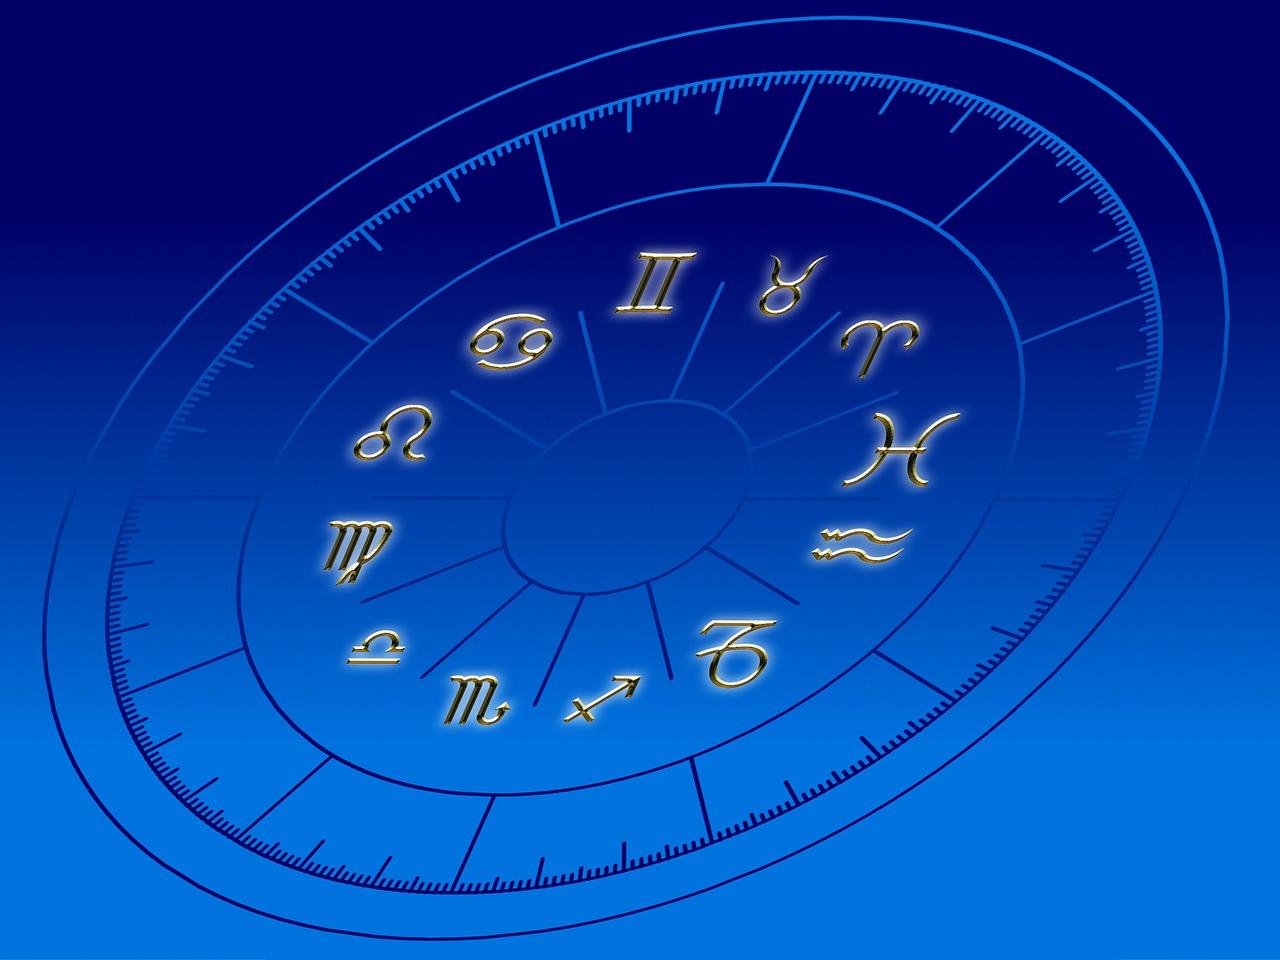 Mystic Milly's Horoscopes